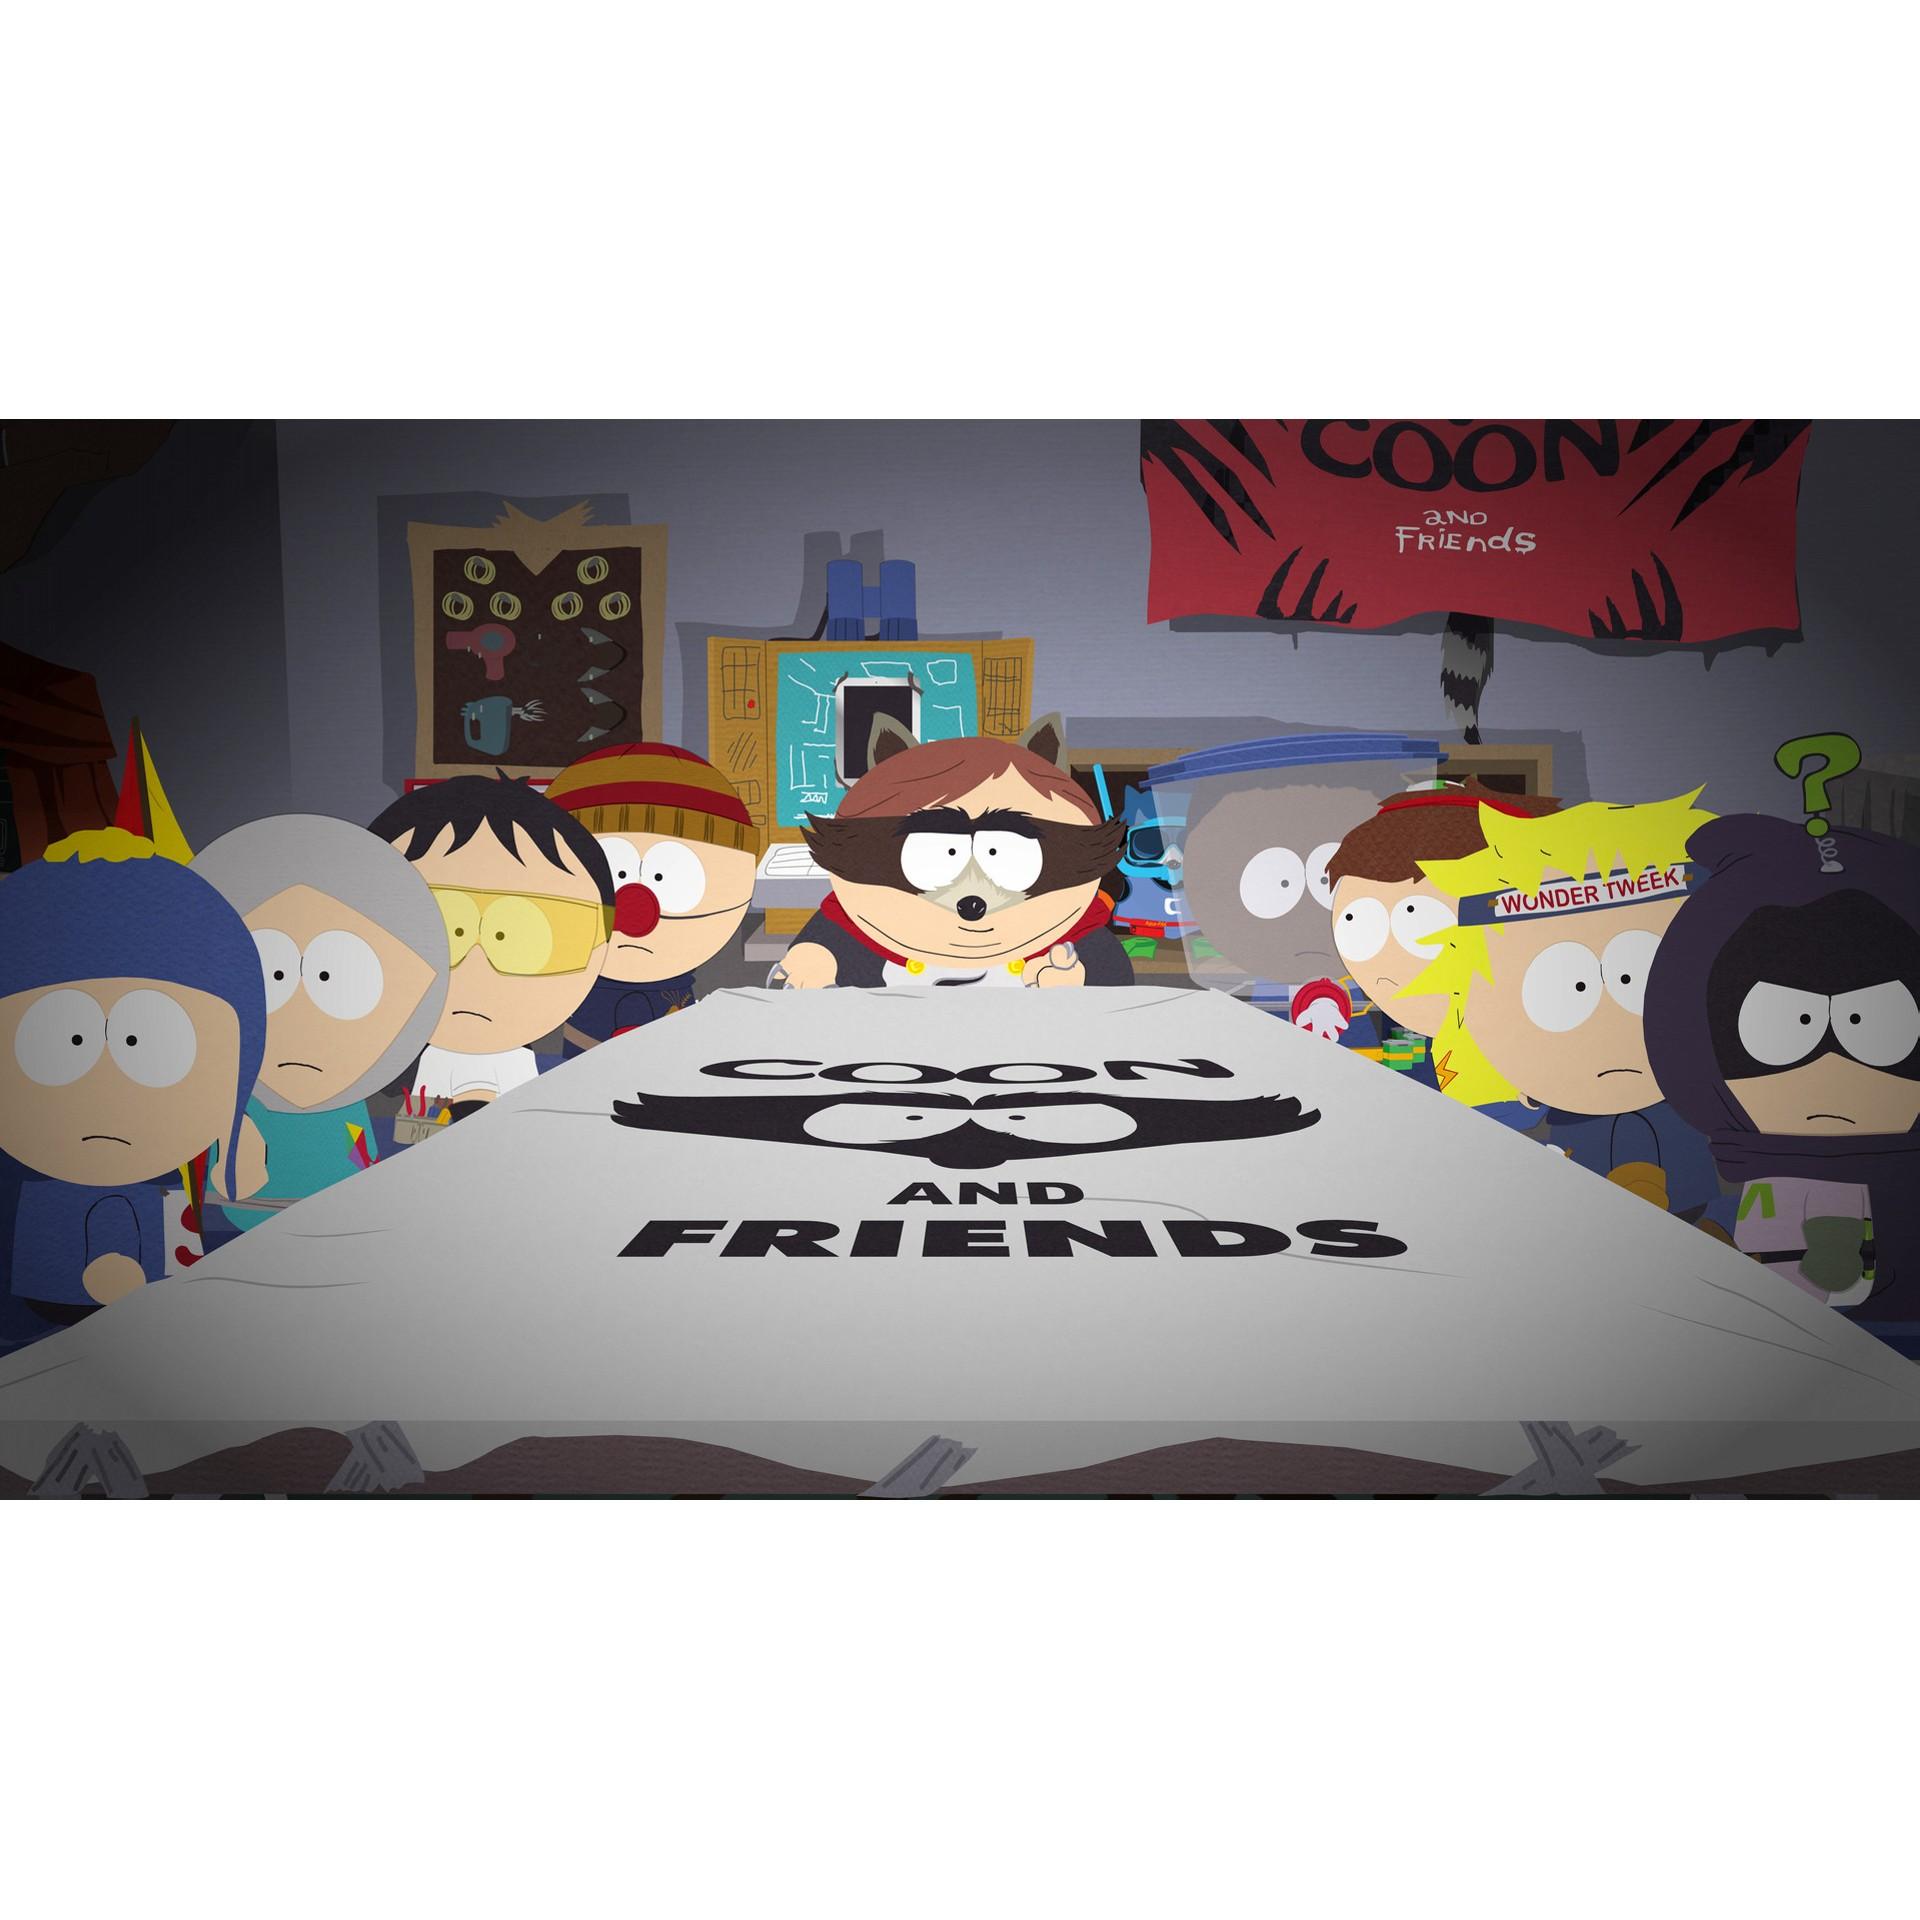 Joc South Park The Fractured But Whole pentru Xbox One 9